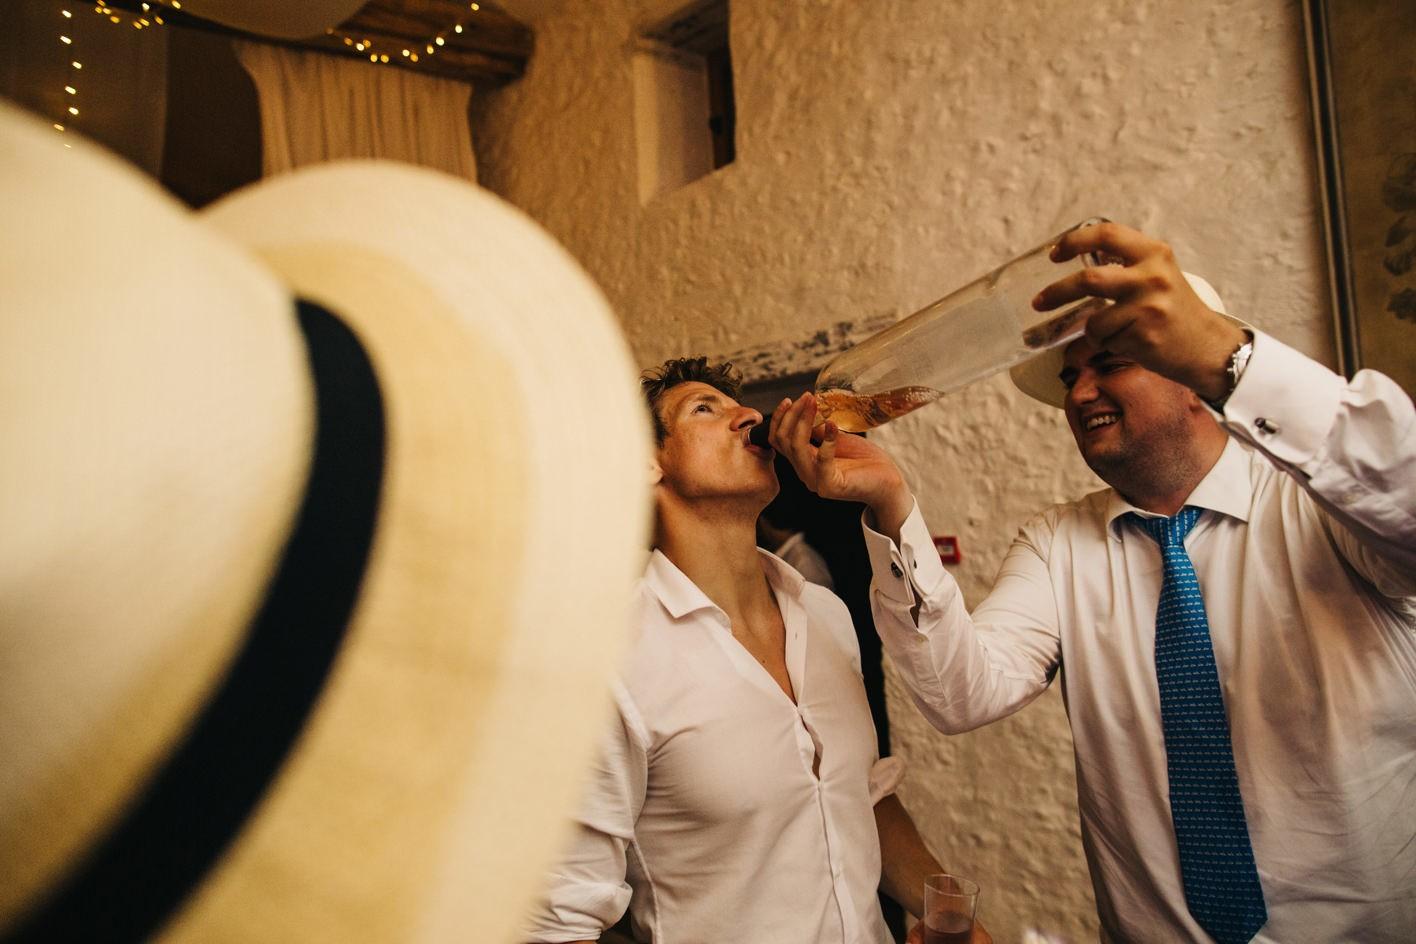 wedding guests drinks bottle of wine